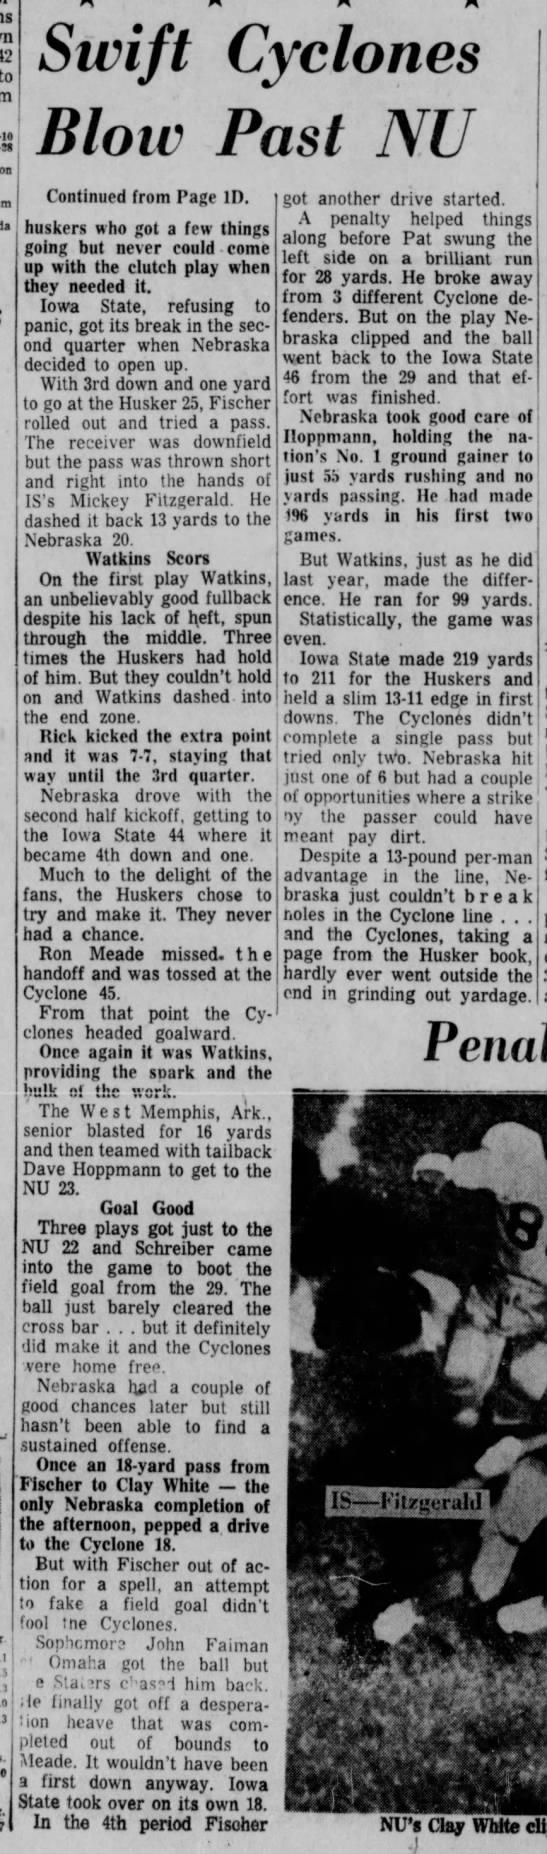 1960 Nebraska vs Iowa State football, part 2 -